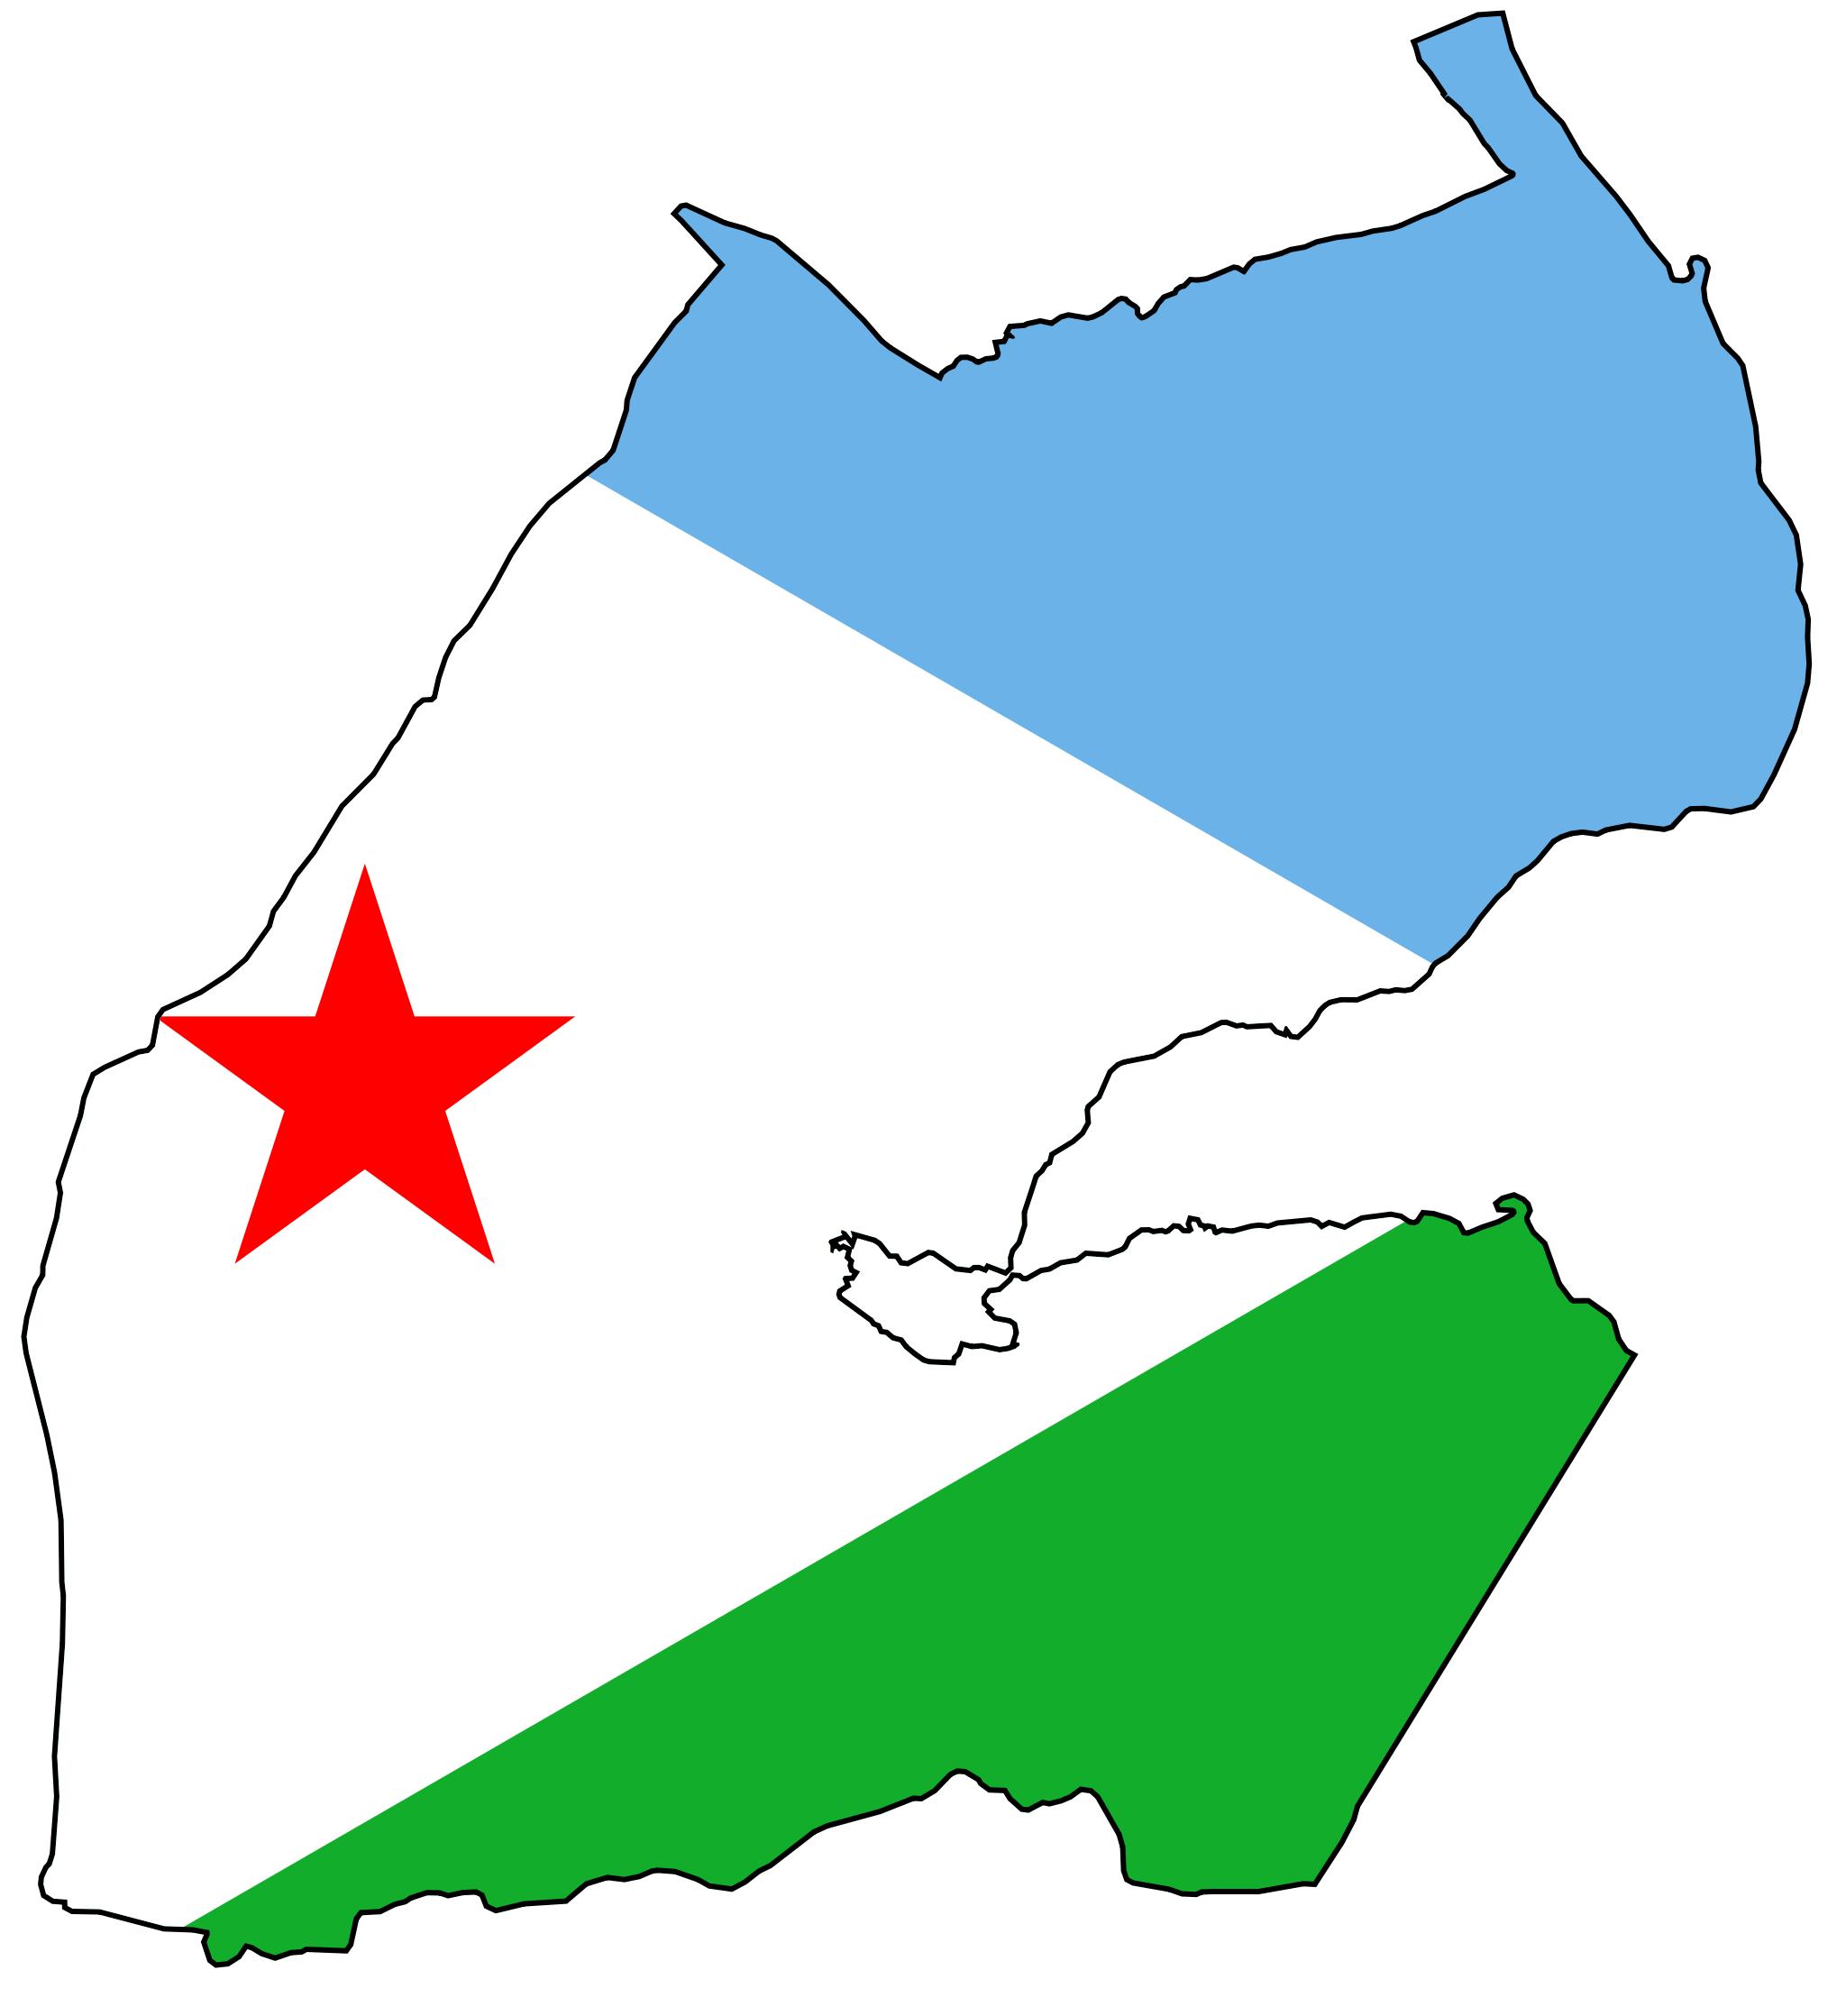 Djibouti Flag Map Mapsofnet Africa Pinterest Djibouti flag